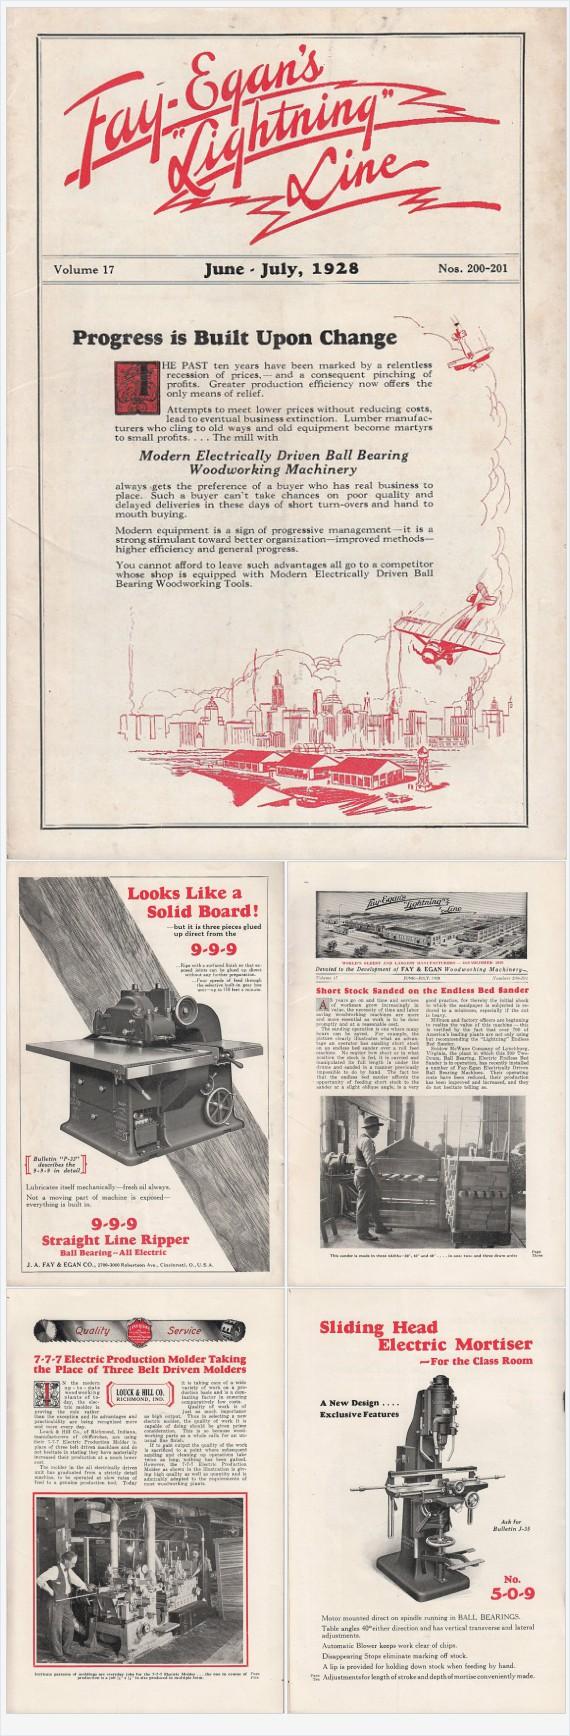 1928 Fay-Egan's Lightning Line vintage Magazine J A Fay & Egan Cincinnati OH Woodworking